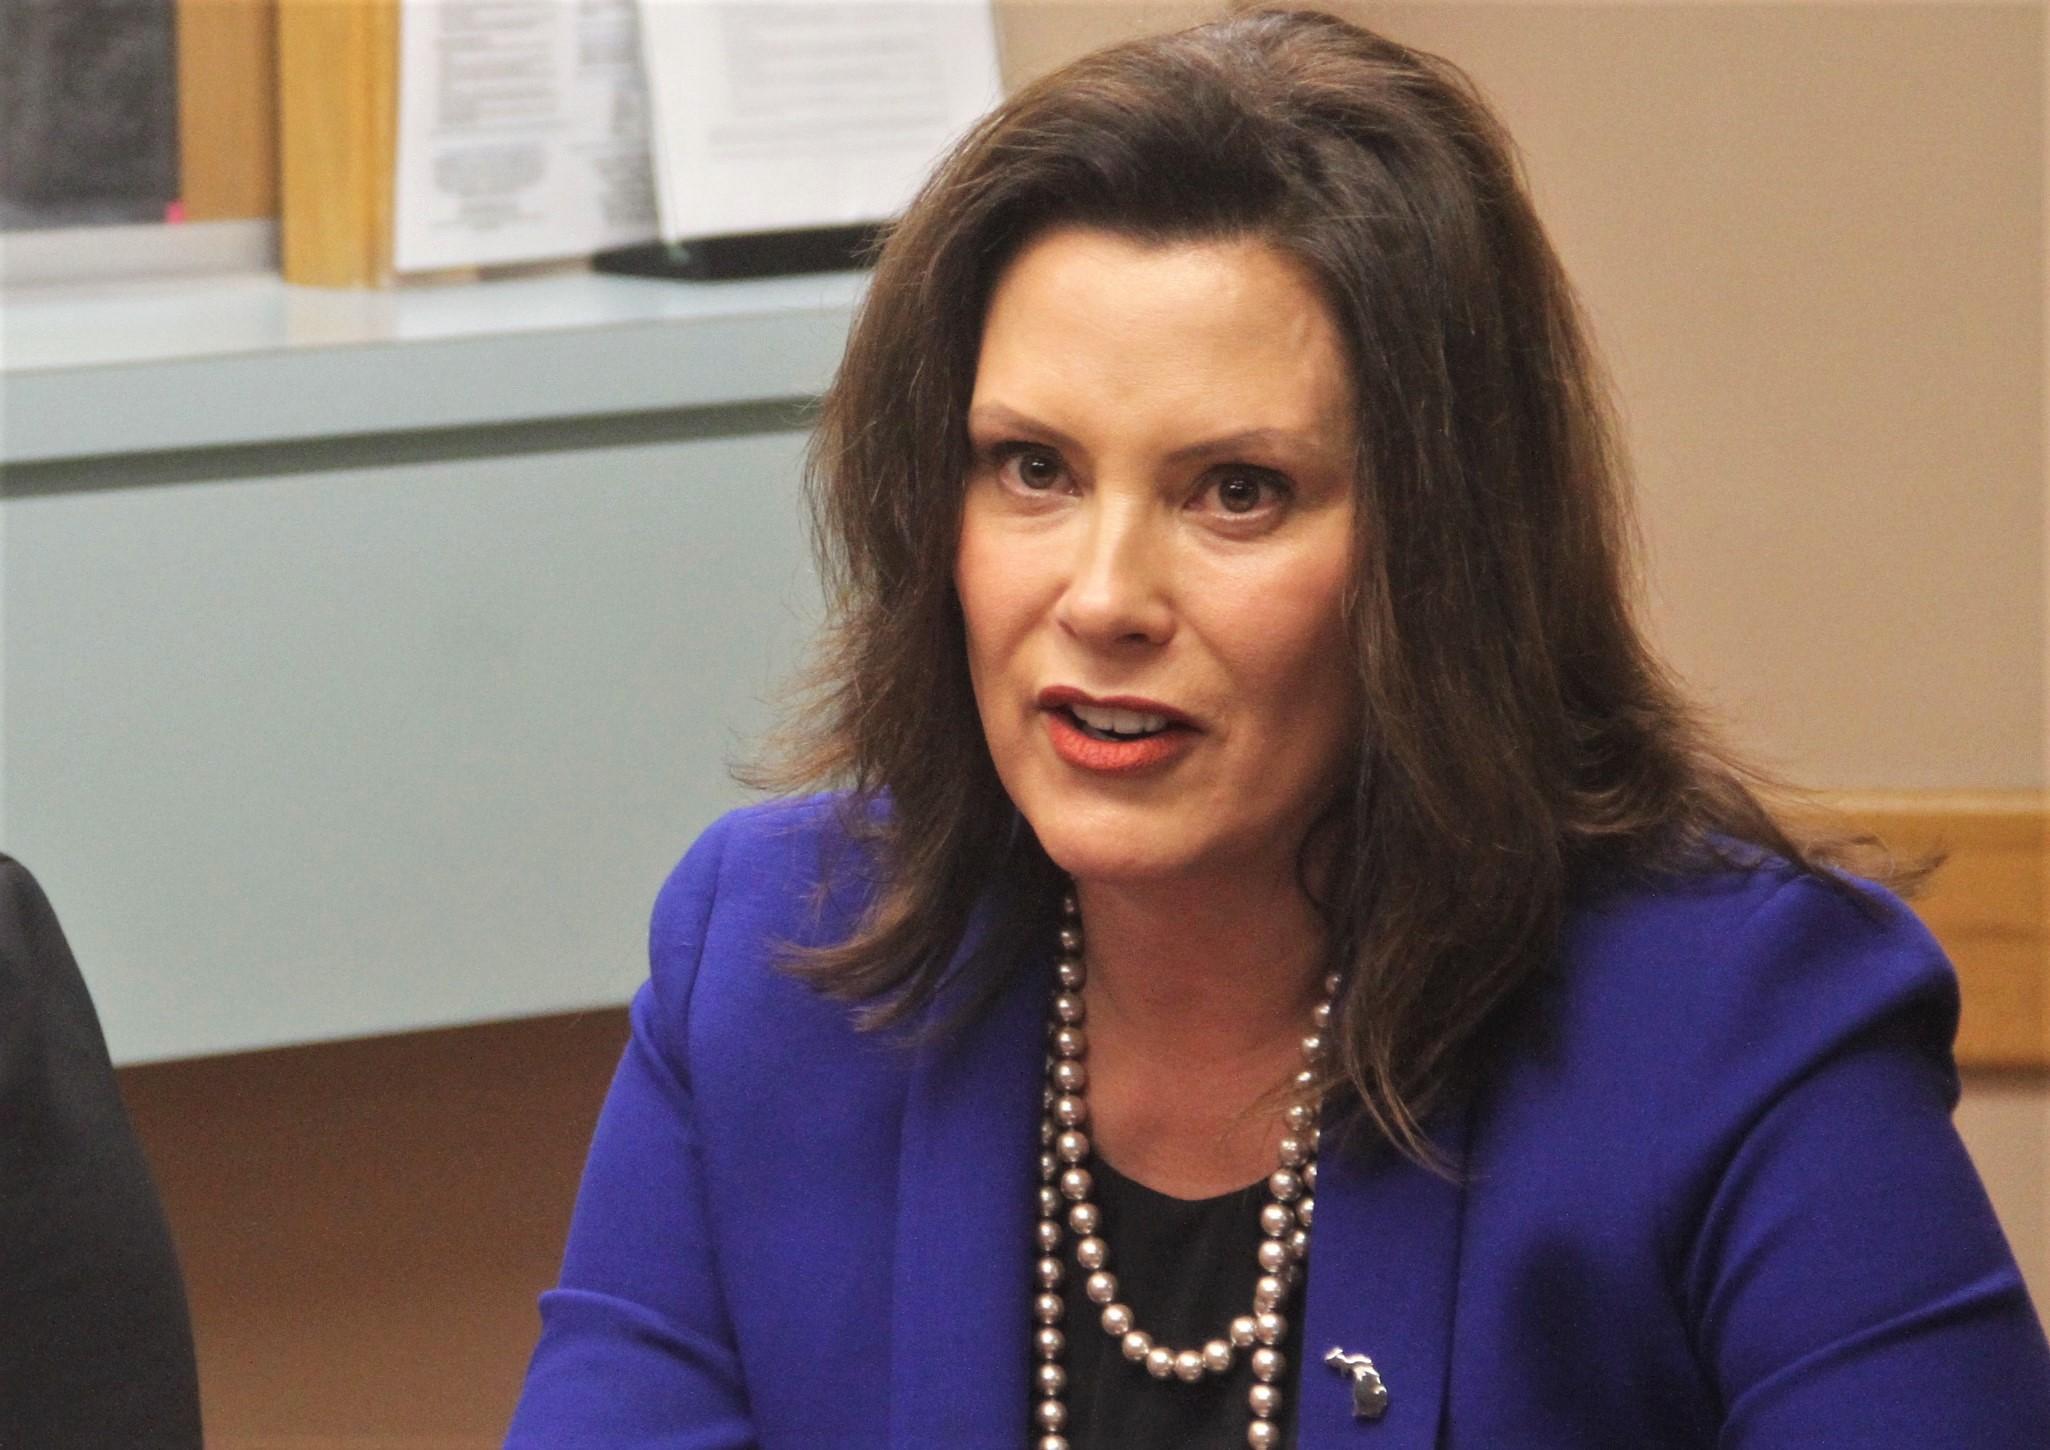 Gov. Whitmer asks legislature to halt Medicaid work requirements